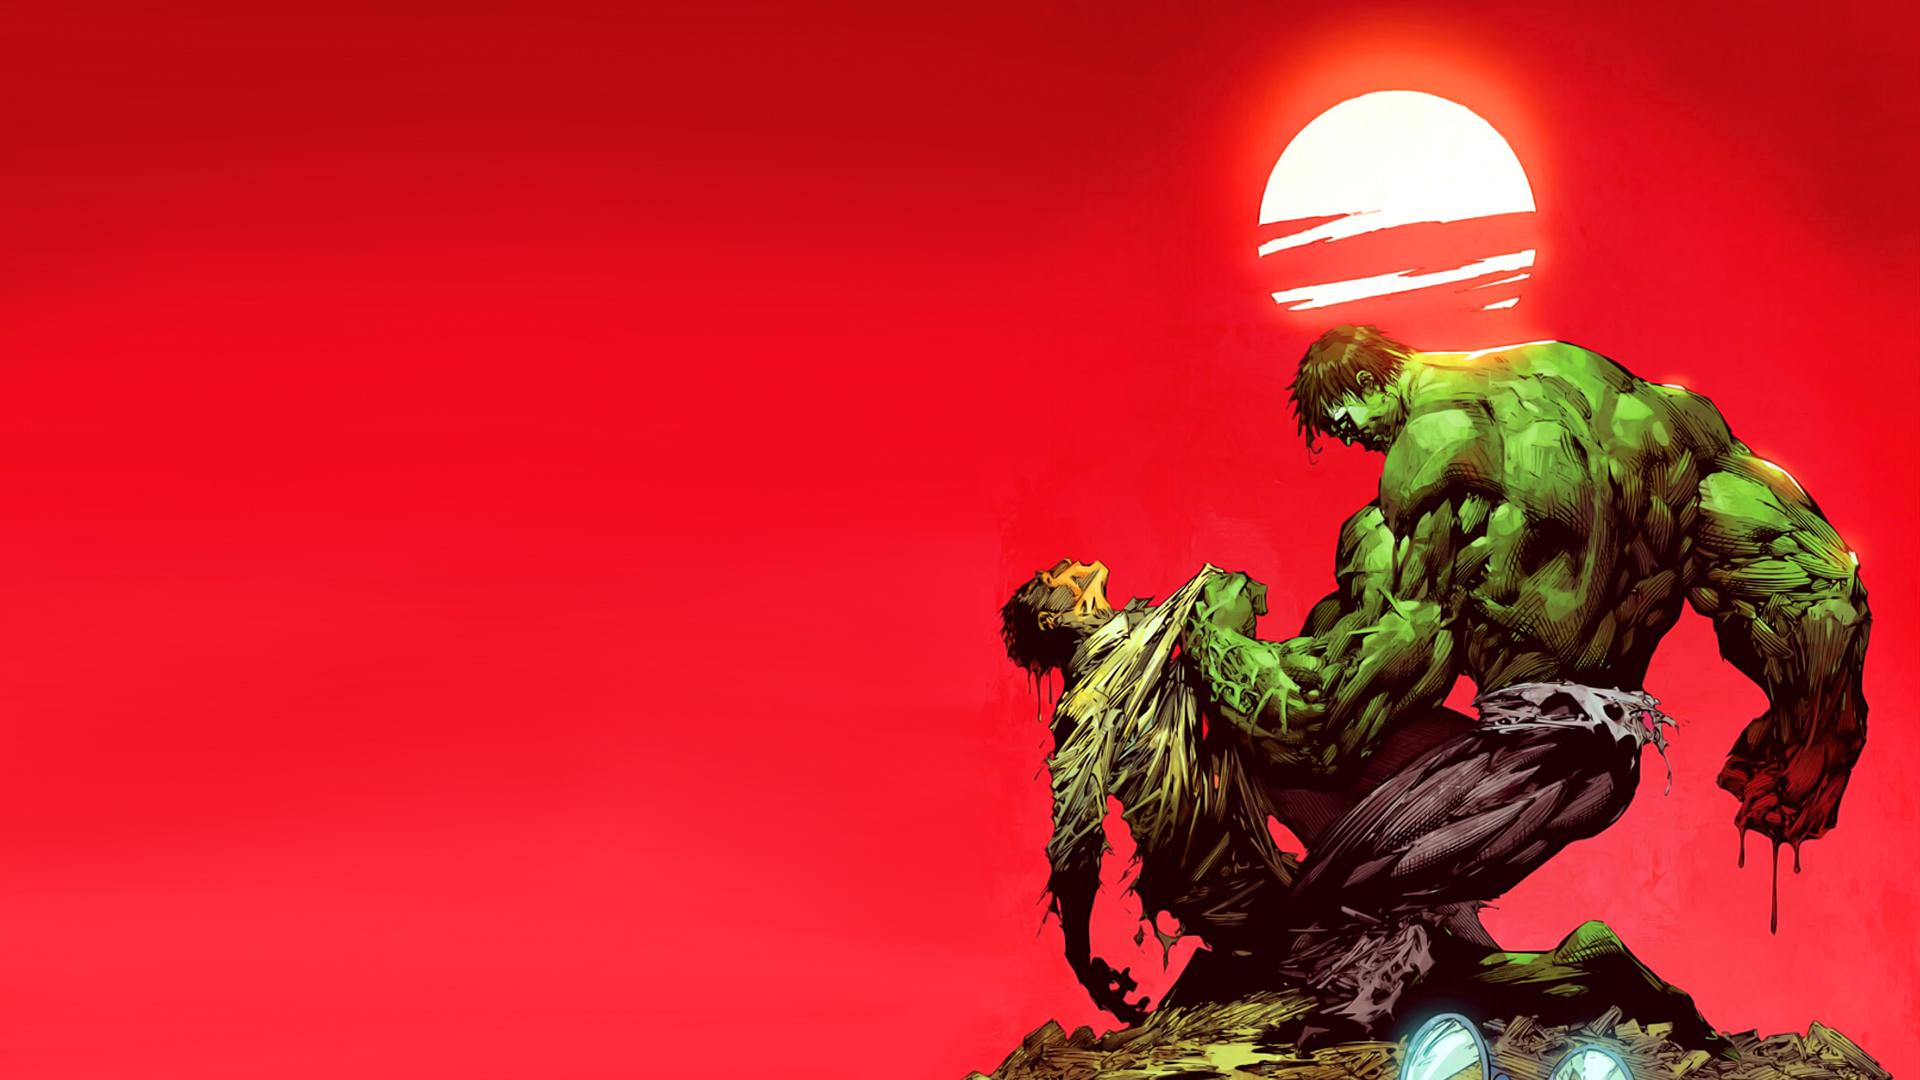 Bande dessin es hulk fond d 39 cran - Telecharger hulk ...